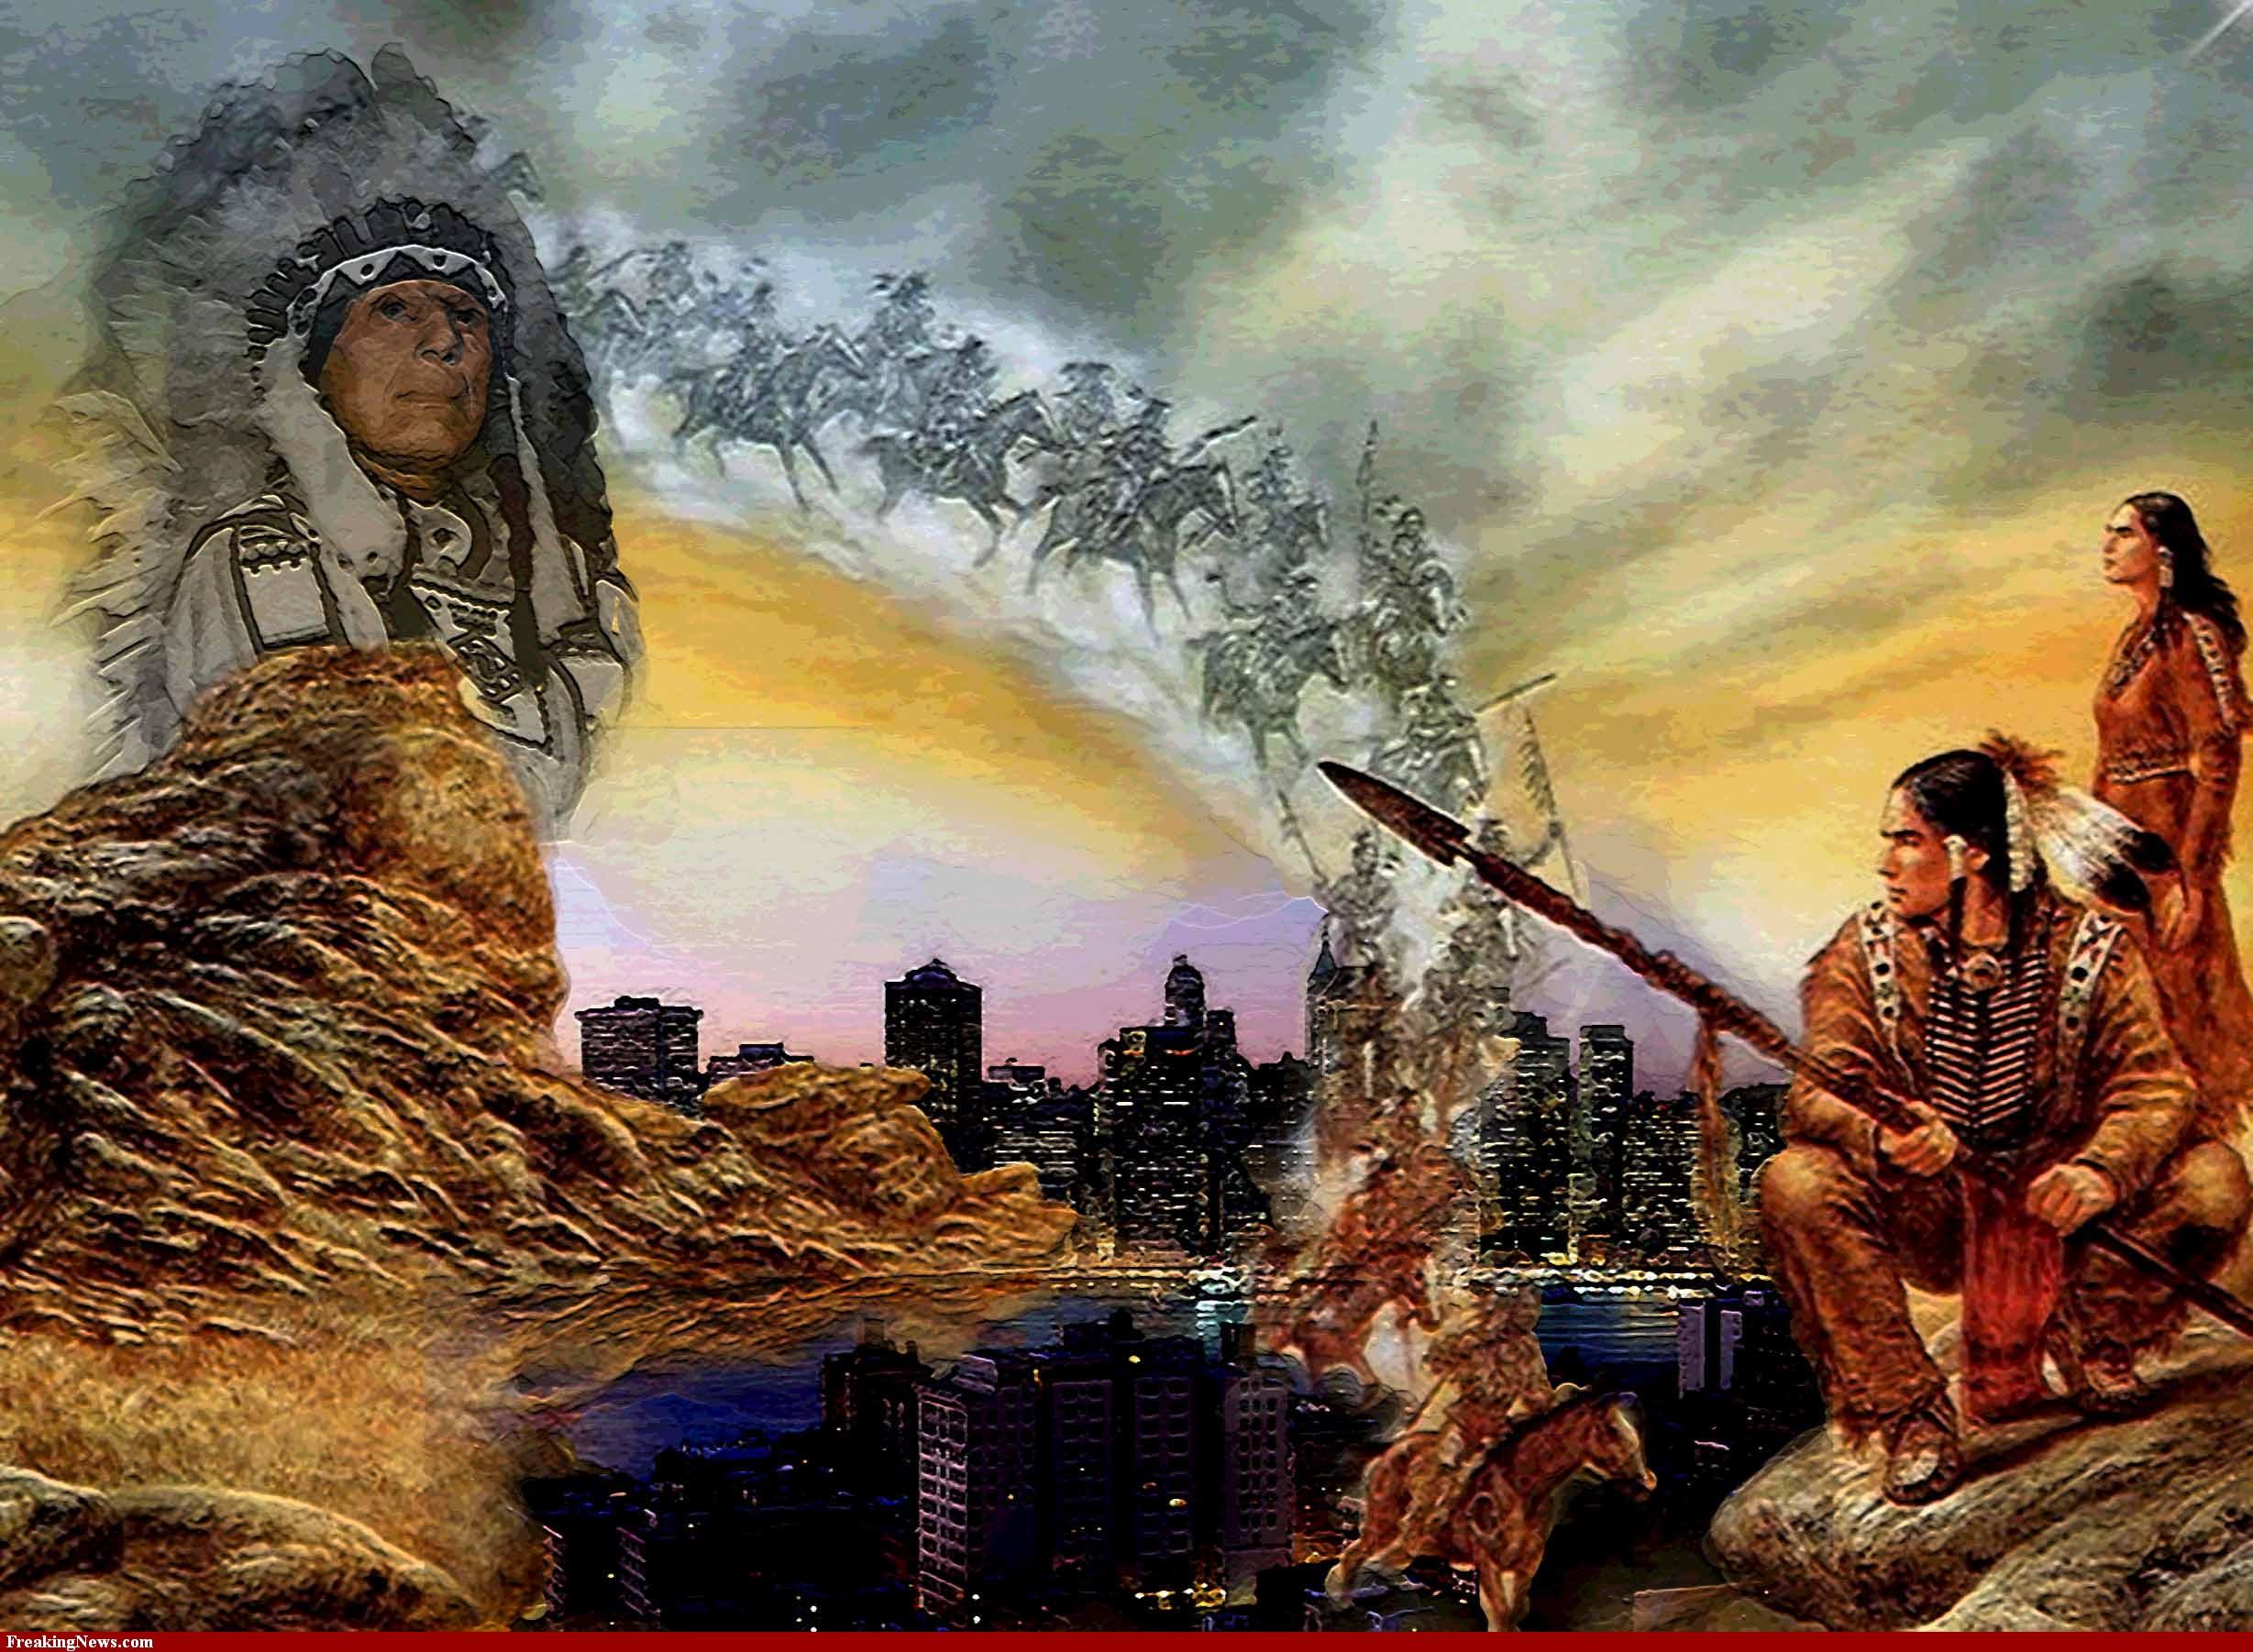 Hd Wallpapers Native American Indian Screensavers 2457 x 1802 670 kB 2457x1802